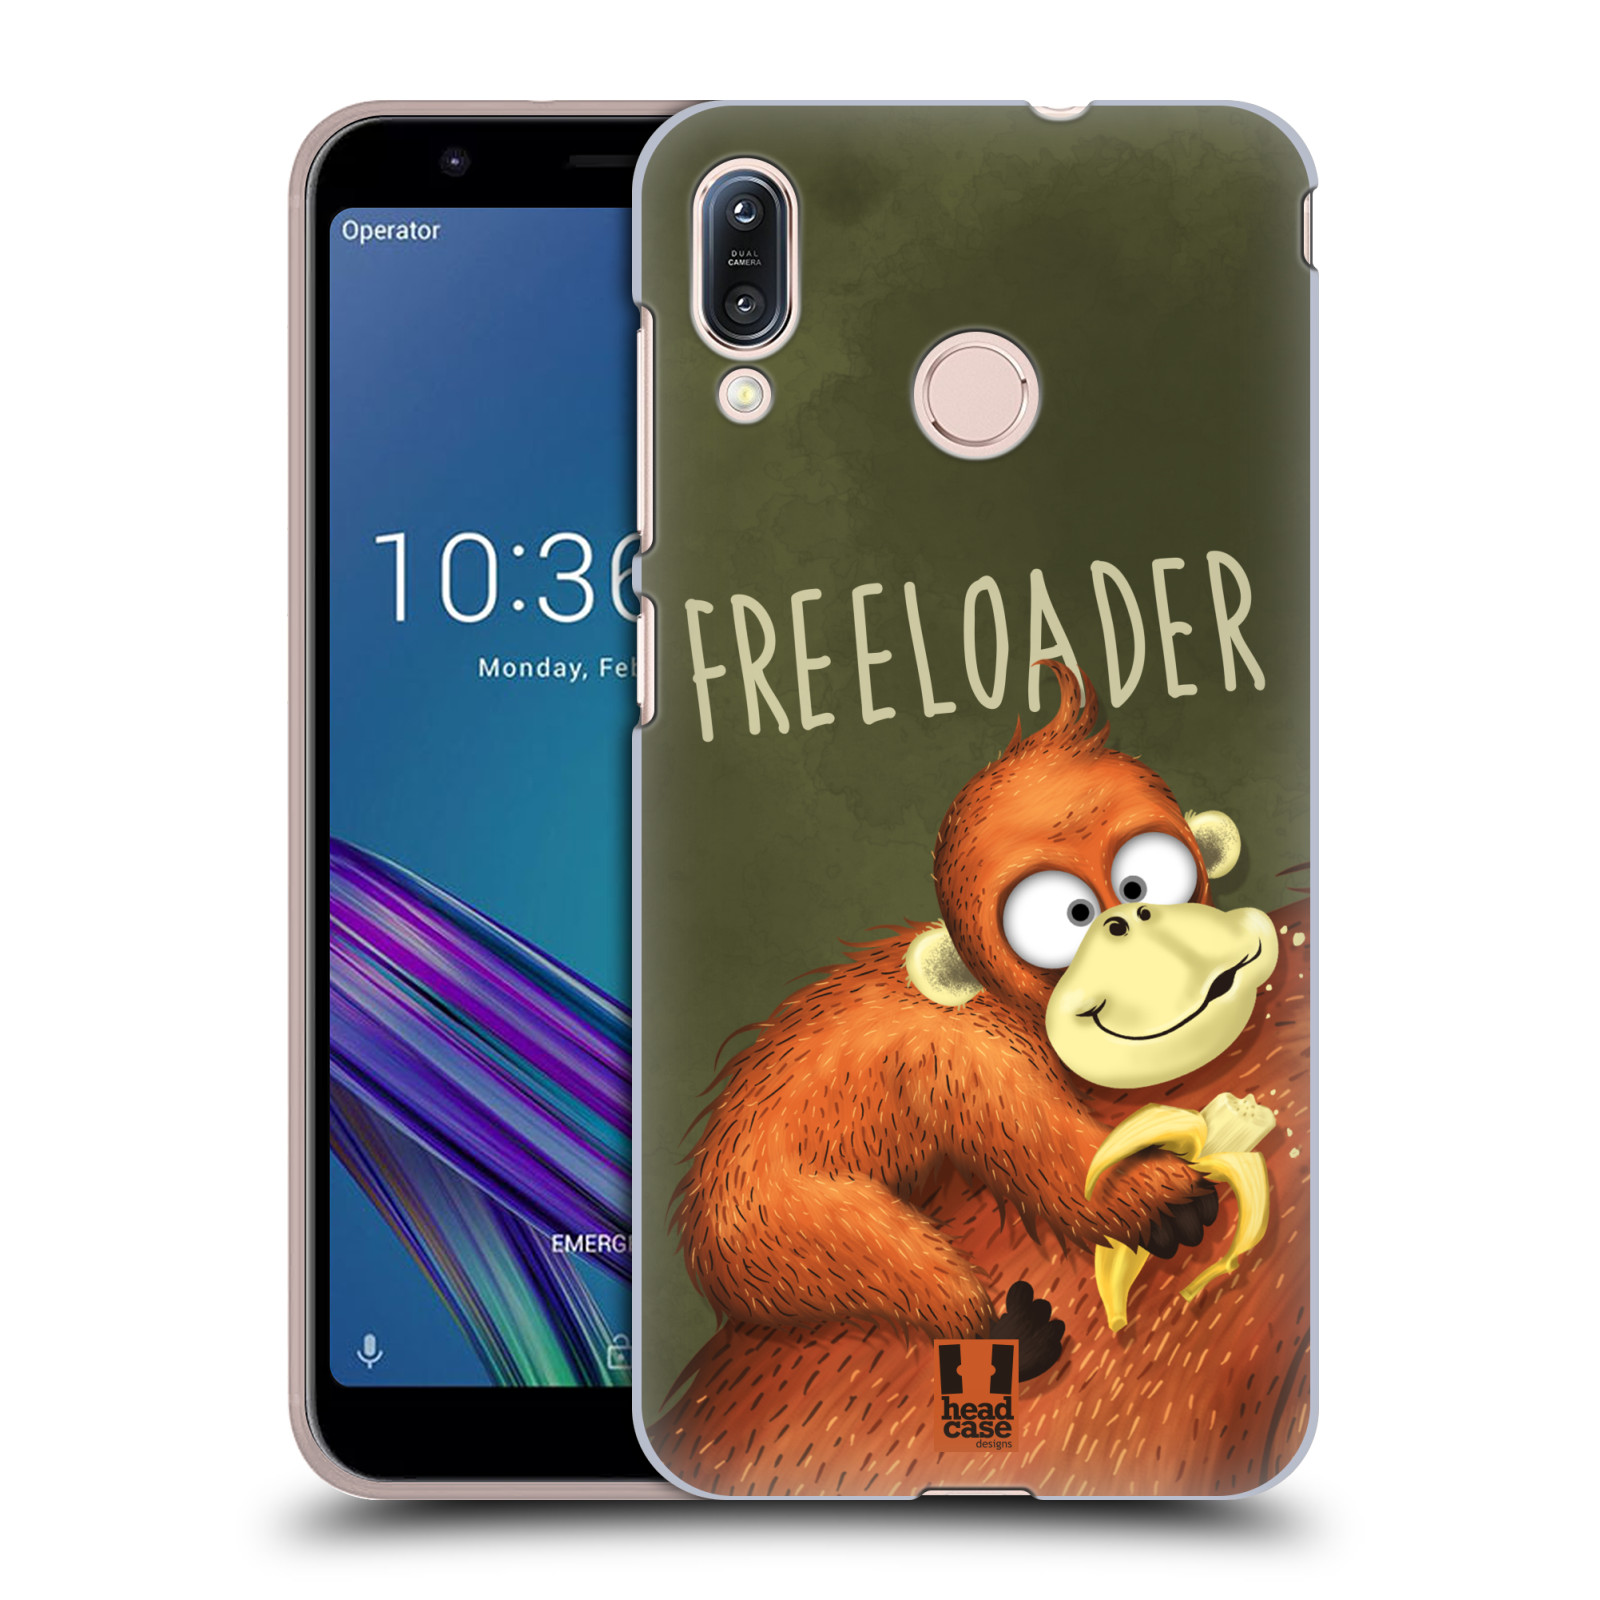 Plastové pouzdro na mobil Asus Zenfone Max M1 ZB555KL - Head Case - Opičák Freeloader